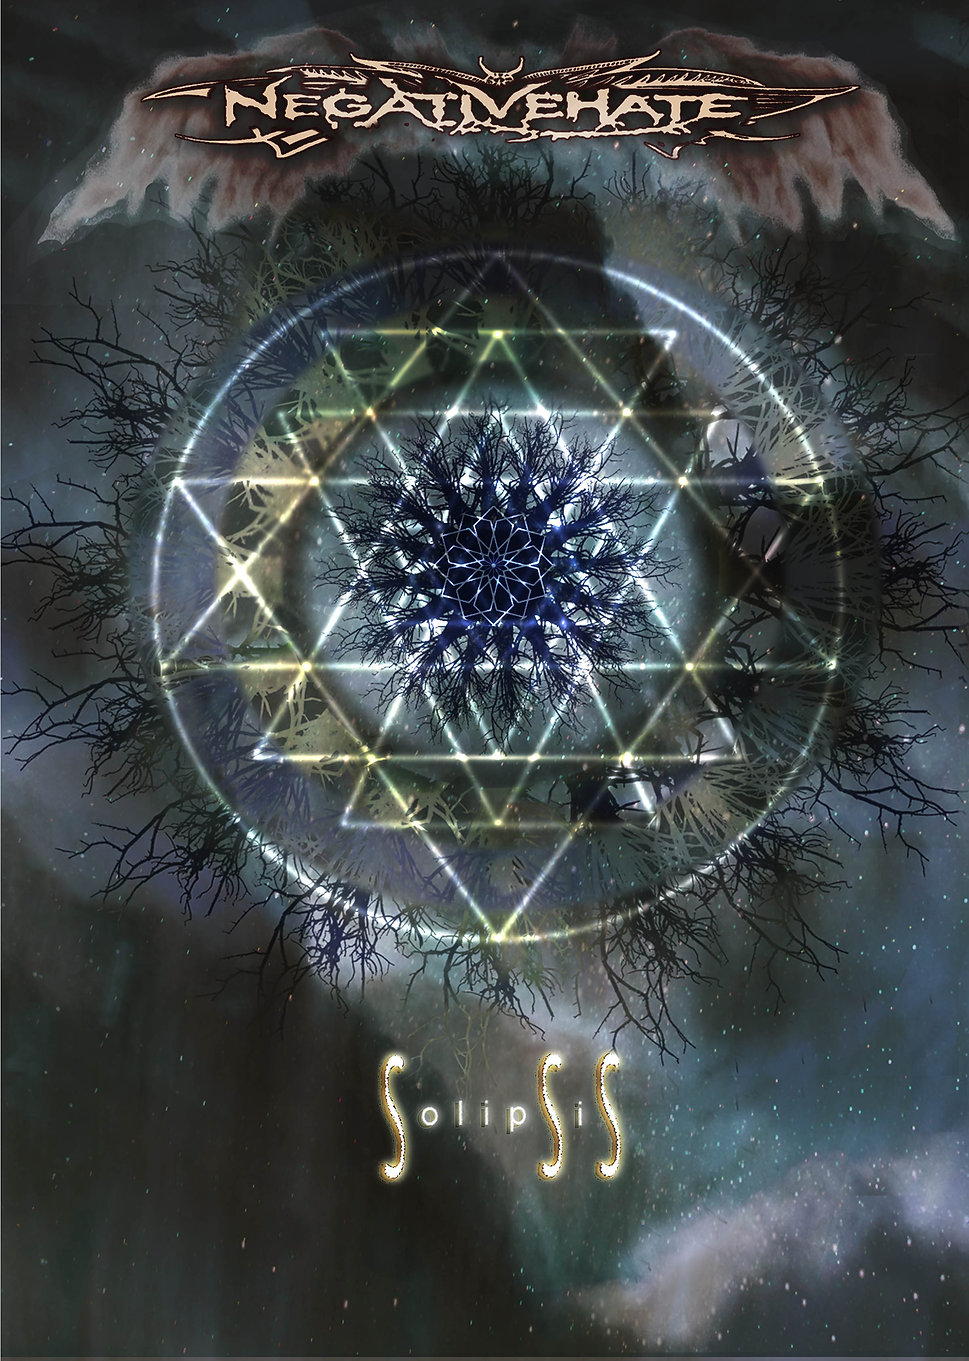 Solipsis Poster 2.jpg